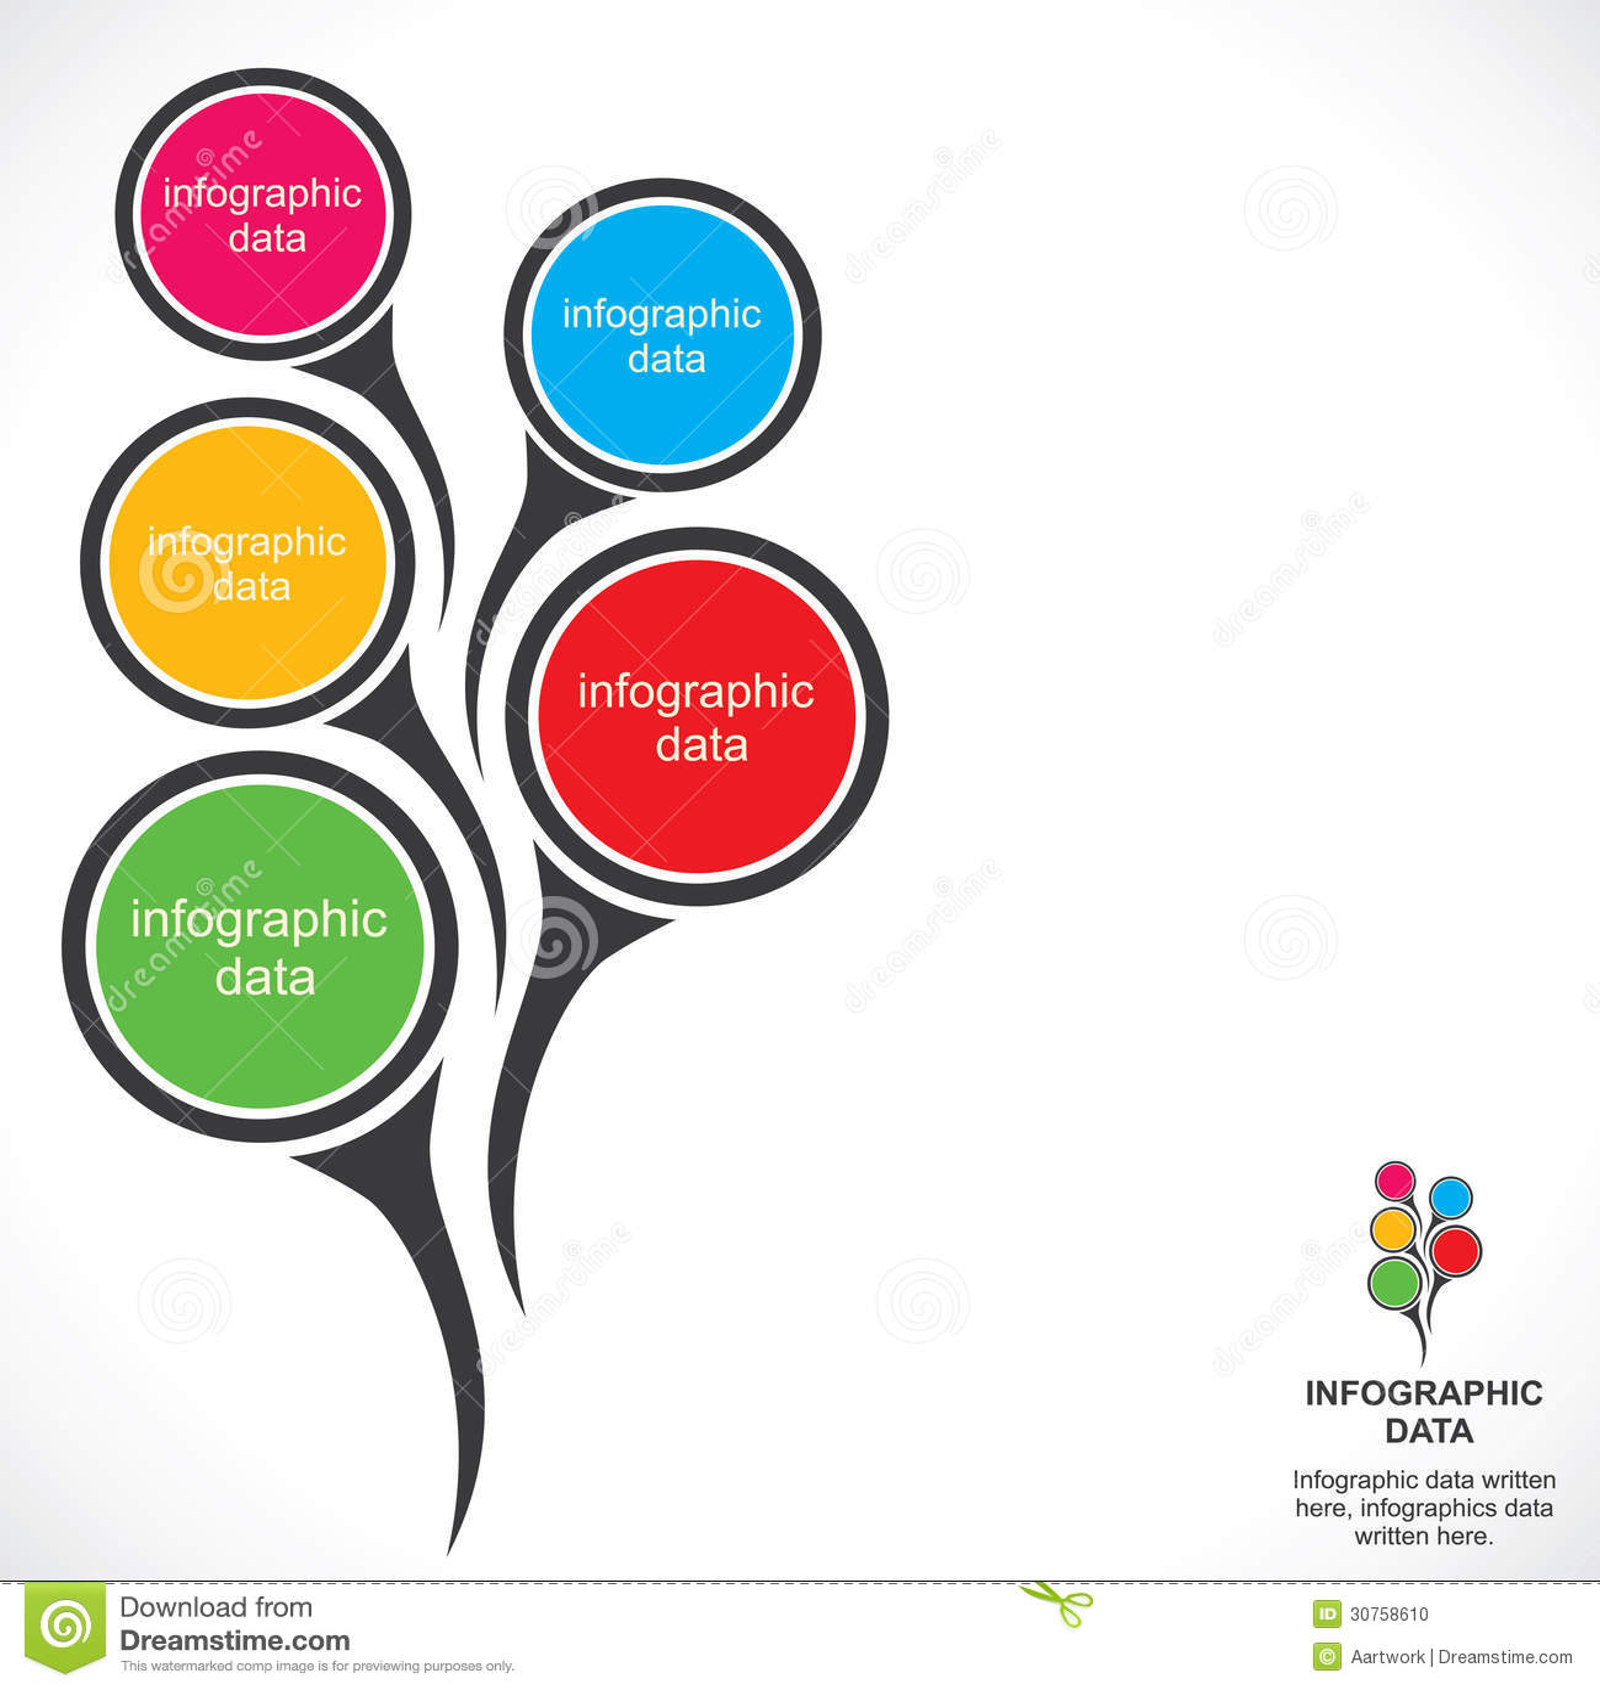 Creative Infographic Design Stock Photo - Image: 30758610